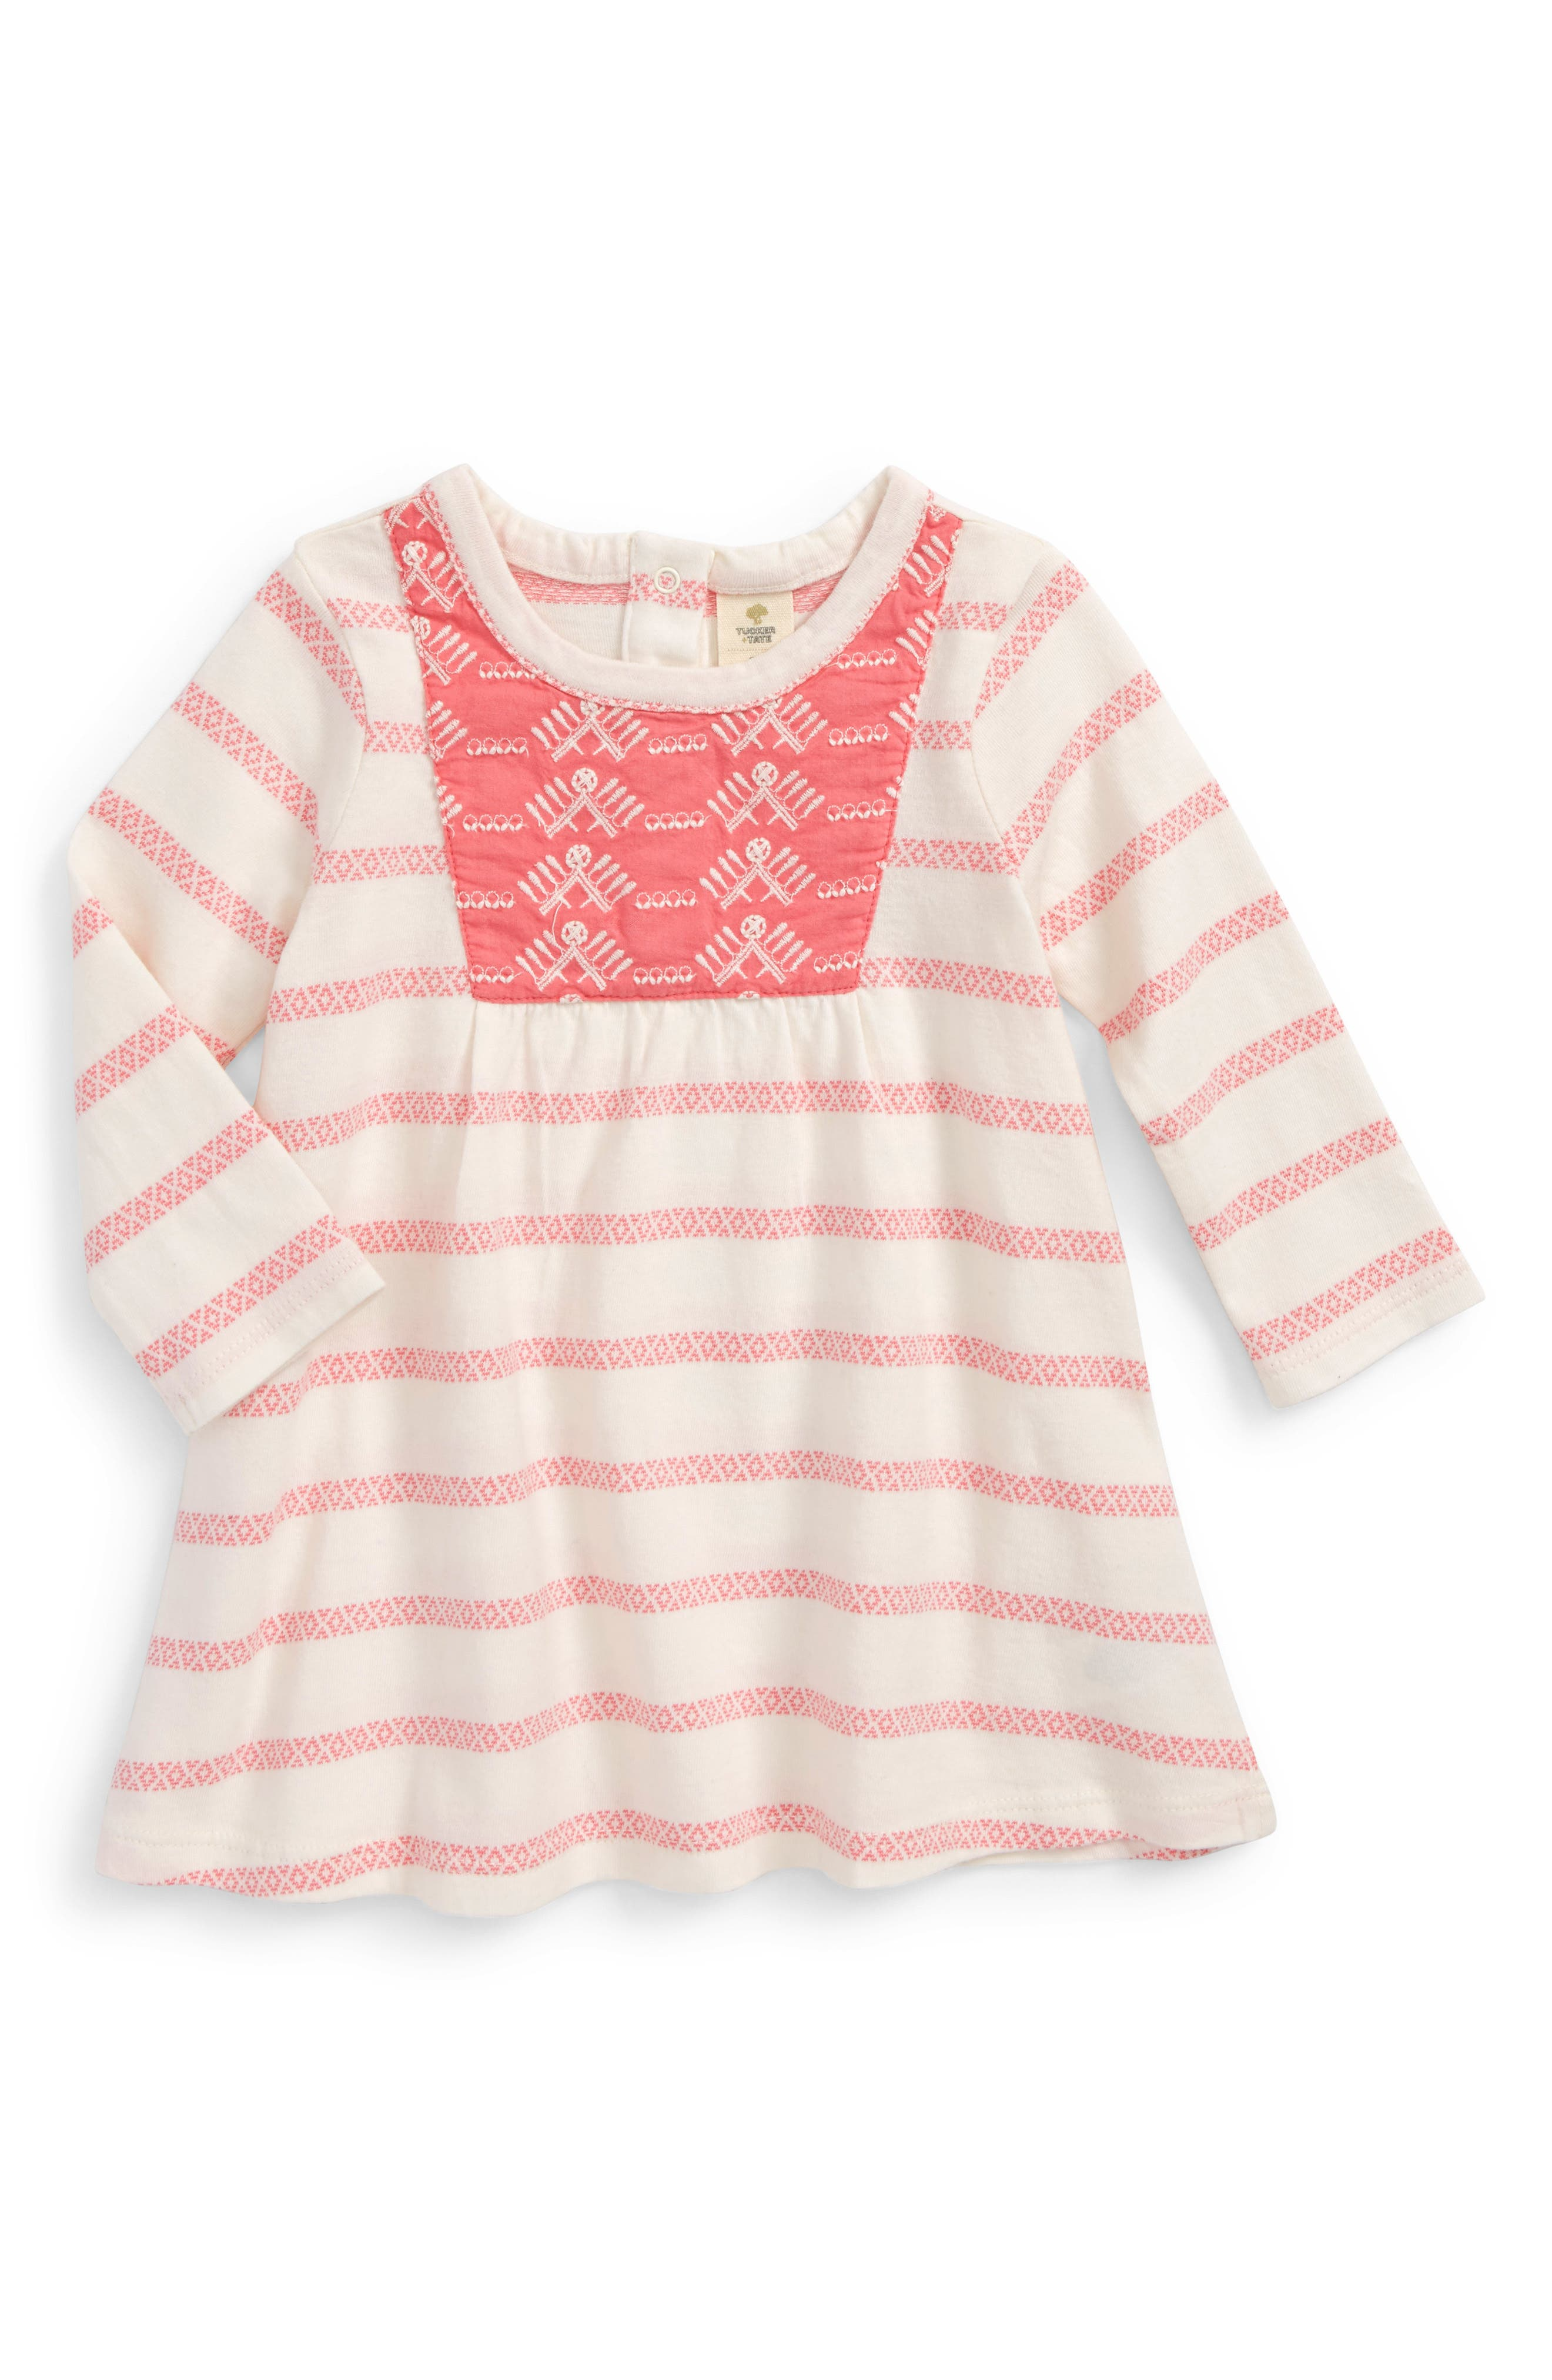 Embroidered Dress,                         Main,                         color, Pink Lemonade- Ivory Stripe